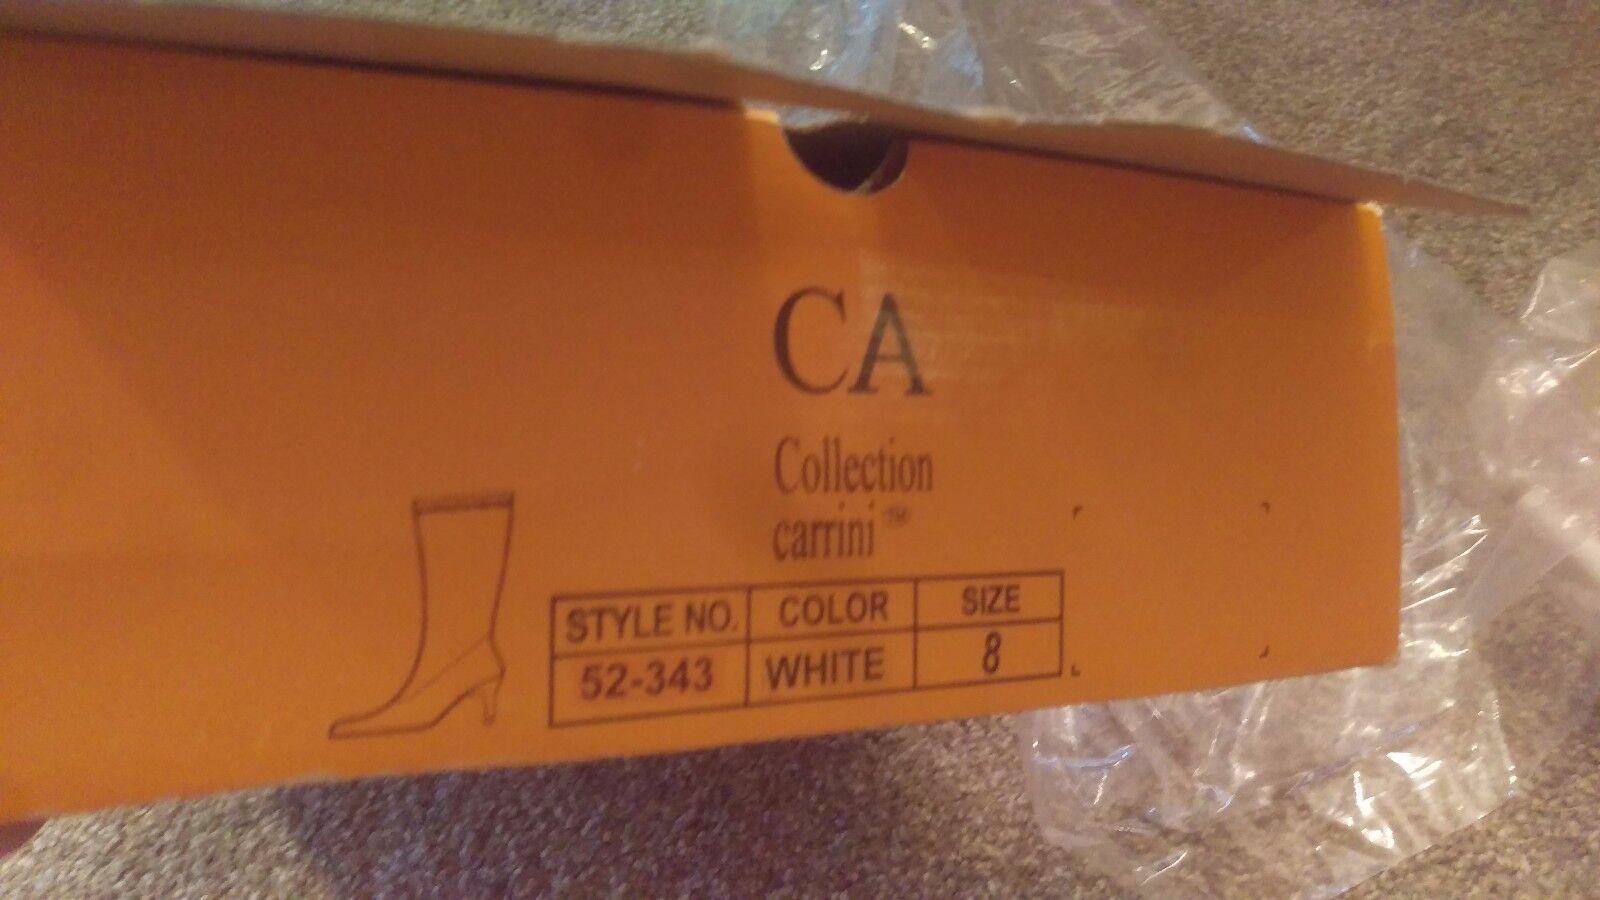 Carrini CA Thigh High Weiß Stripper Stiefel Wet Costume Heel w/ Naughty Maid Costume Wet sz 8 4462ff